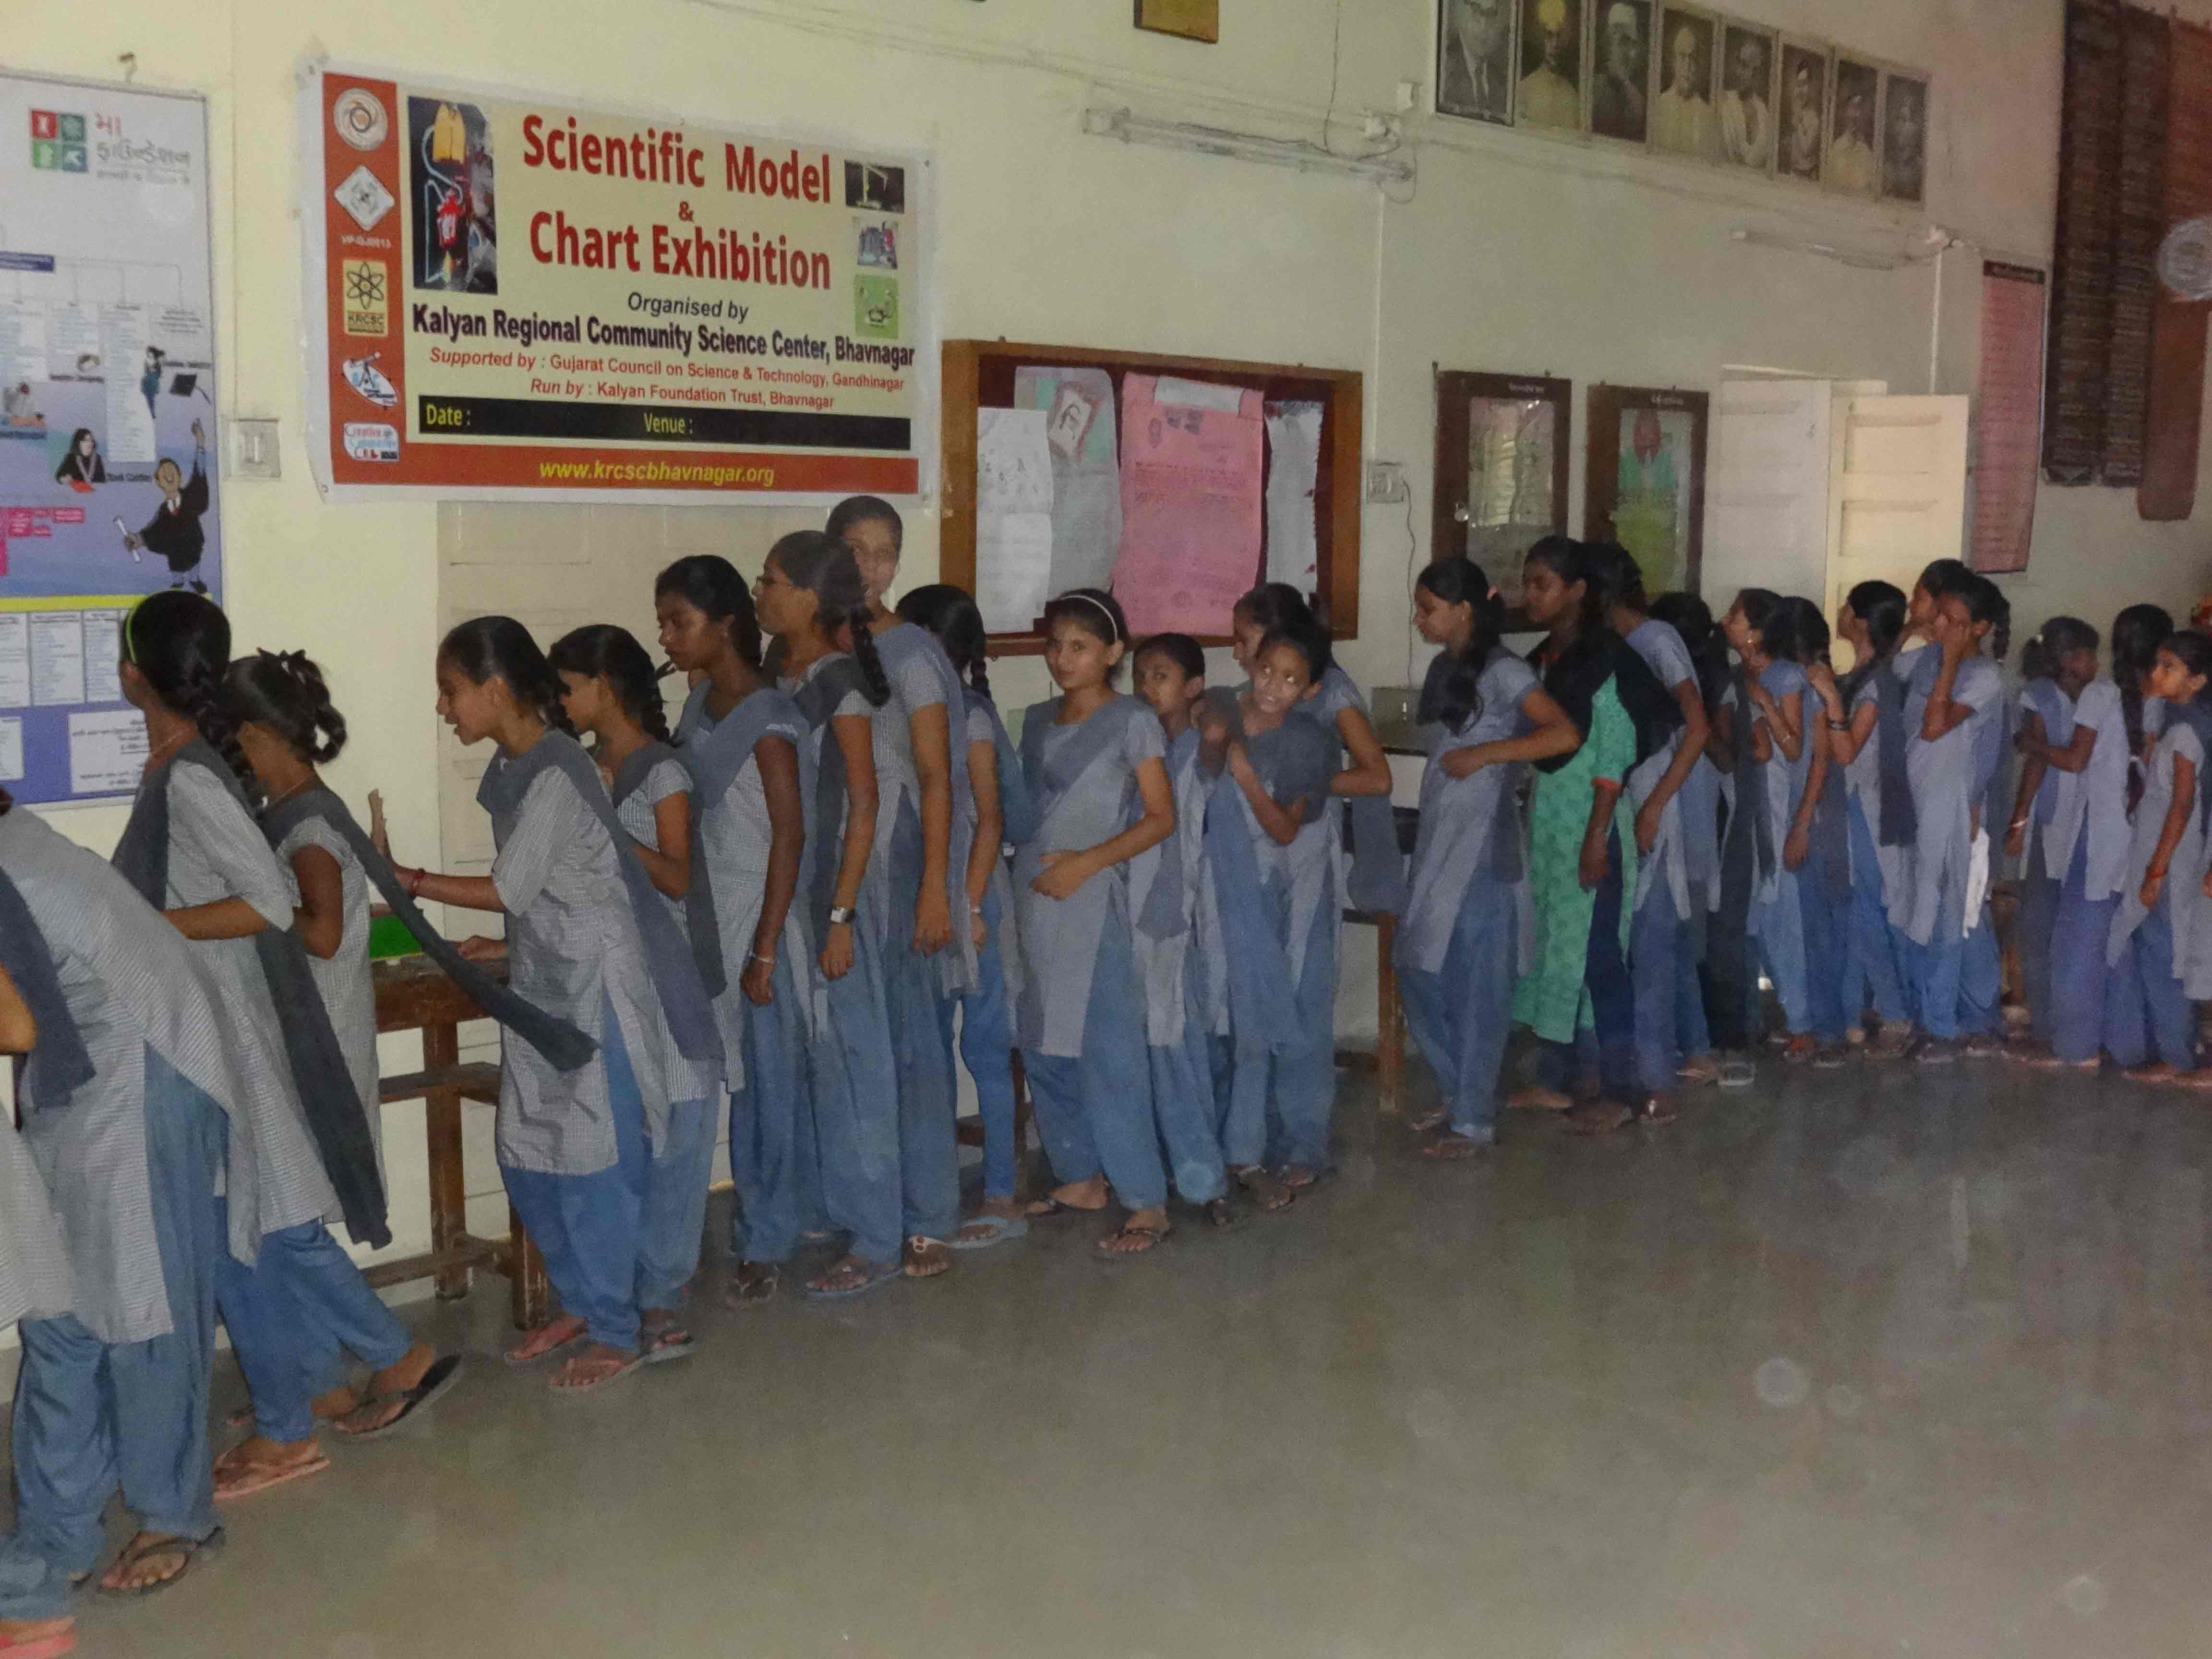 Kalyan Regional Community Science Center